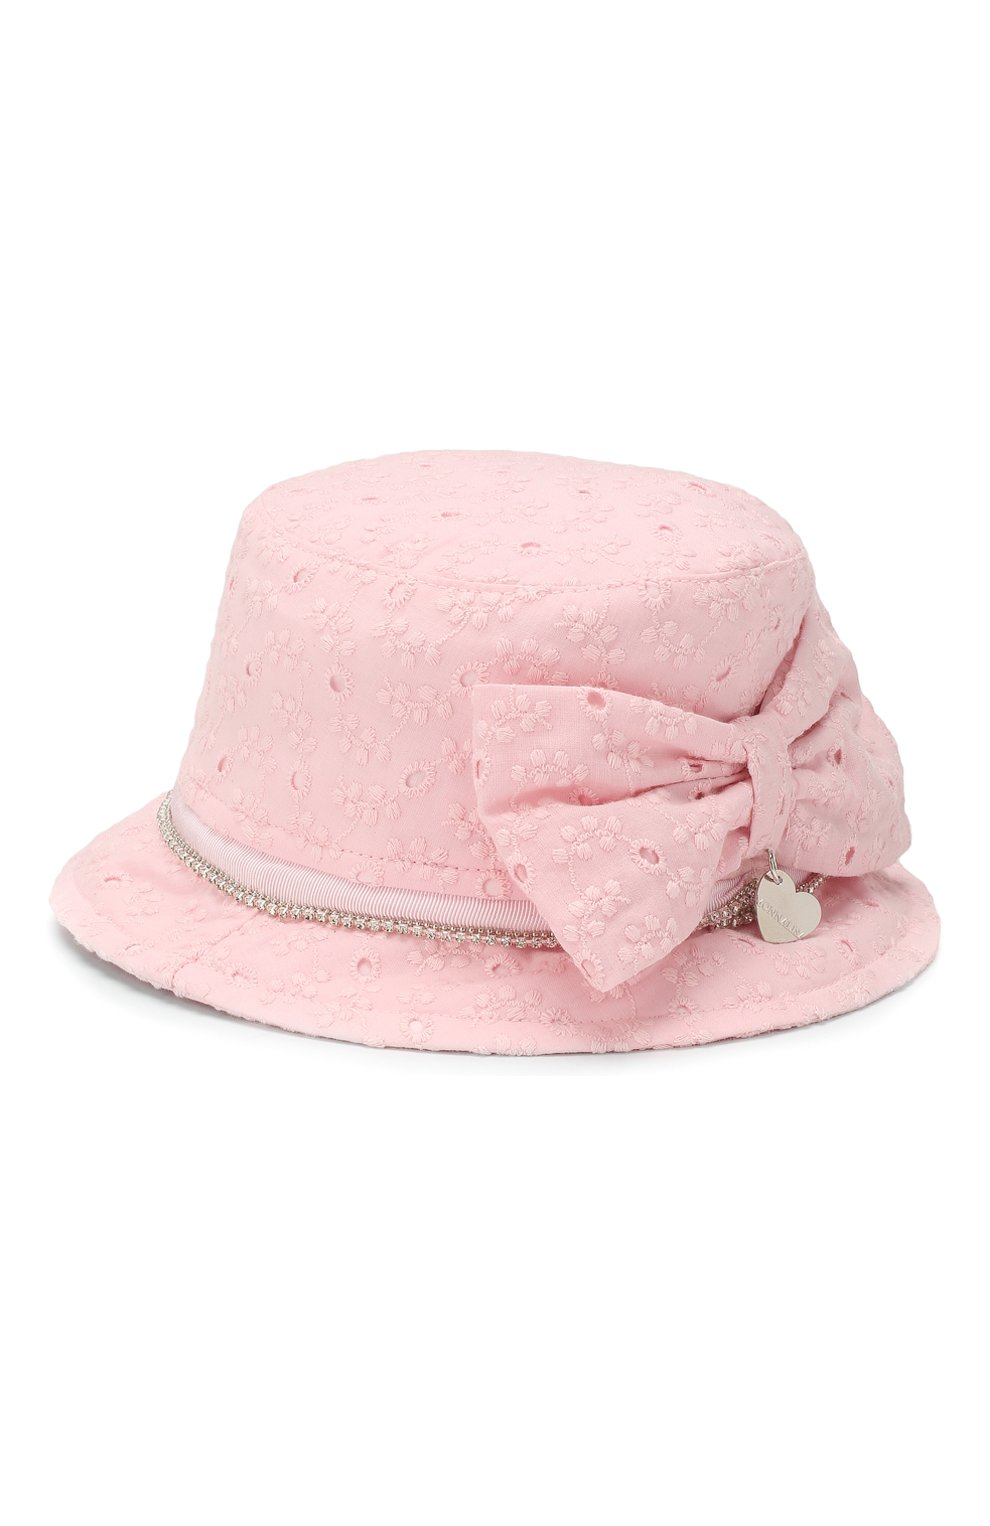 Детская панама MONNALISA розового цвета, арт. 395015 | Фото 2